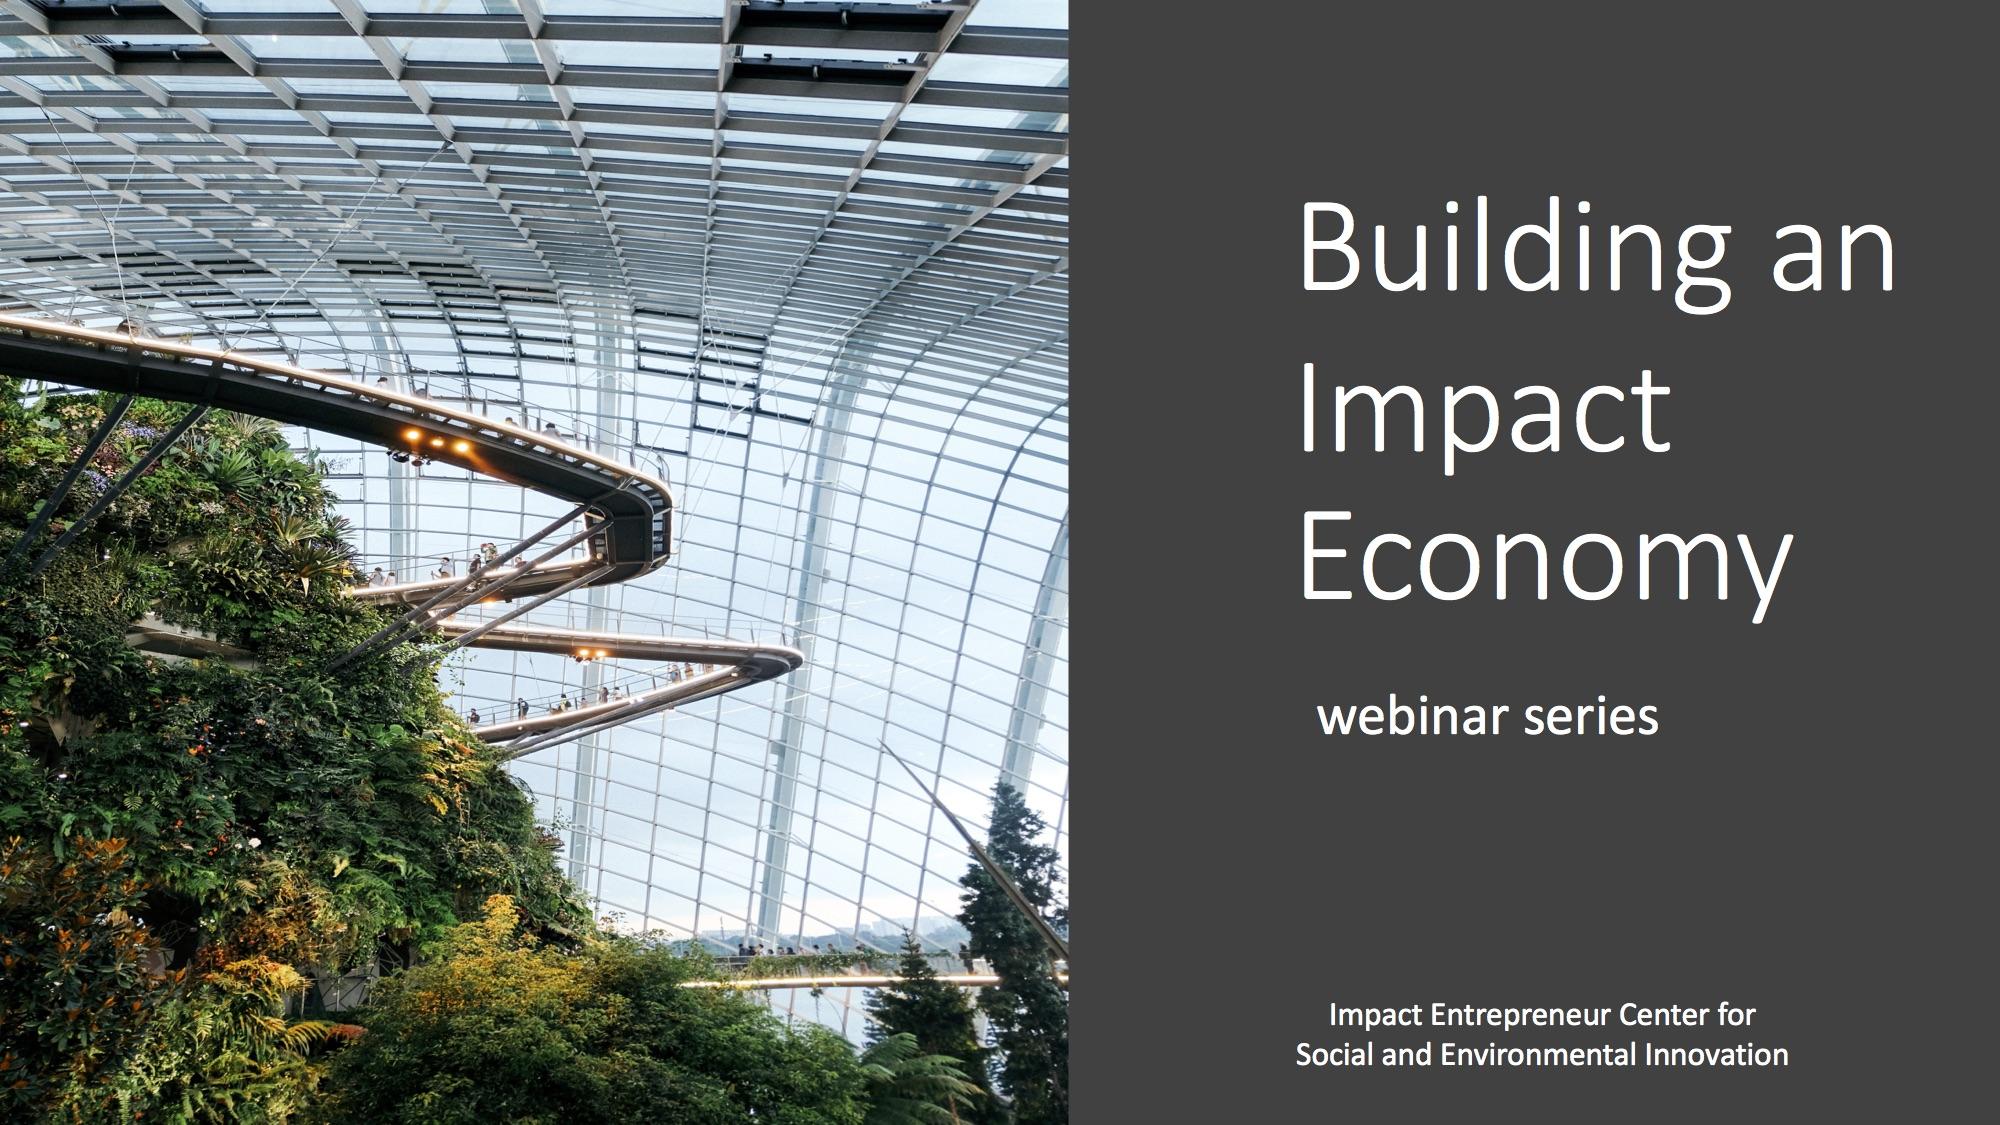 Building and Impact Economy Lead Image.jpg